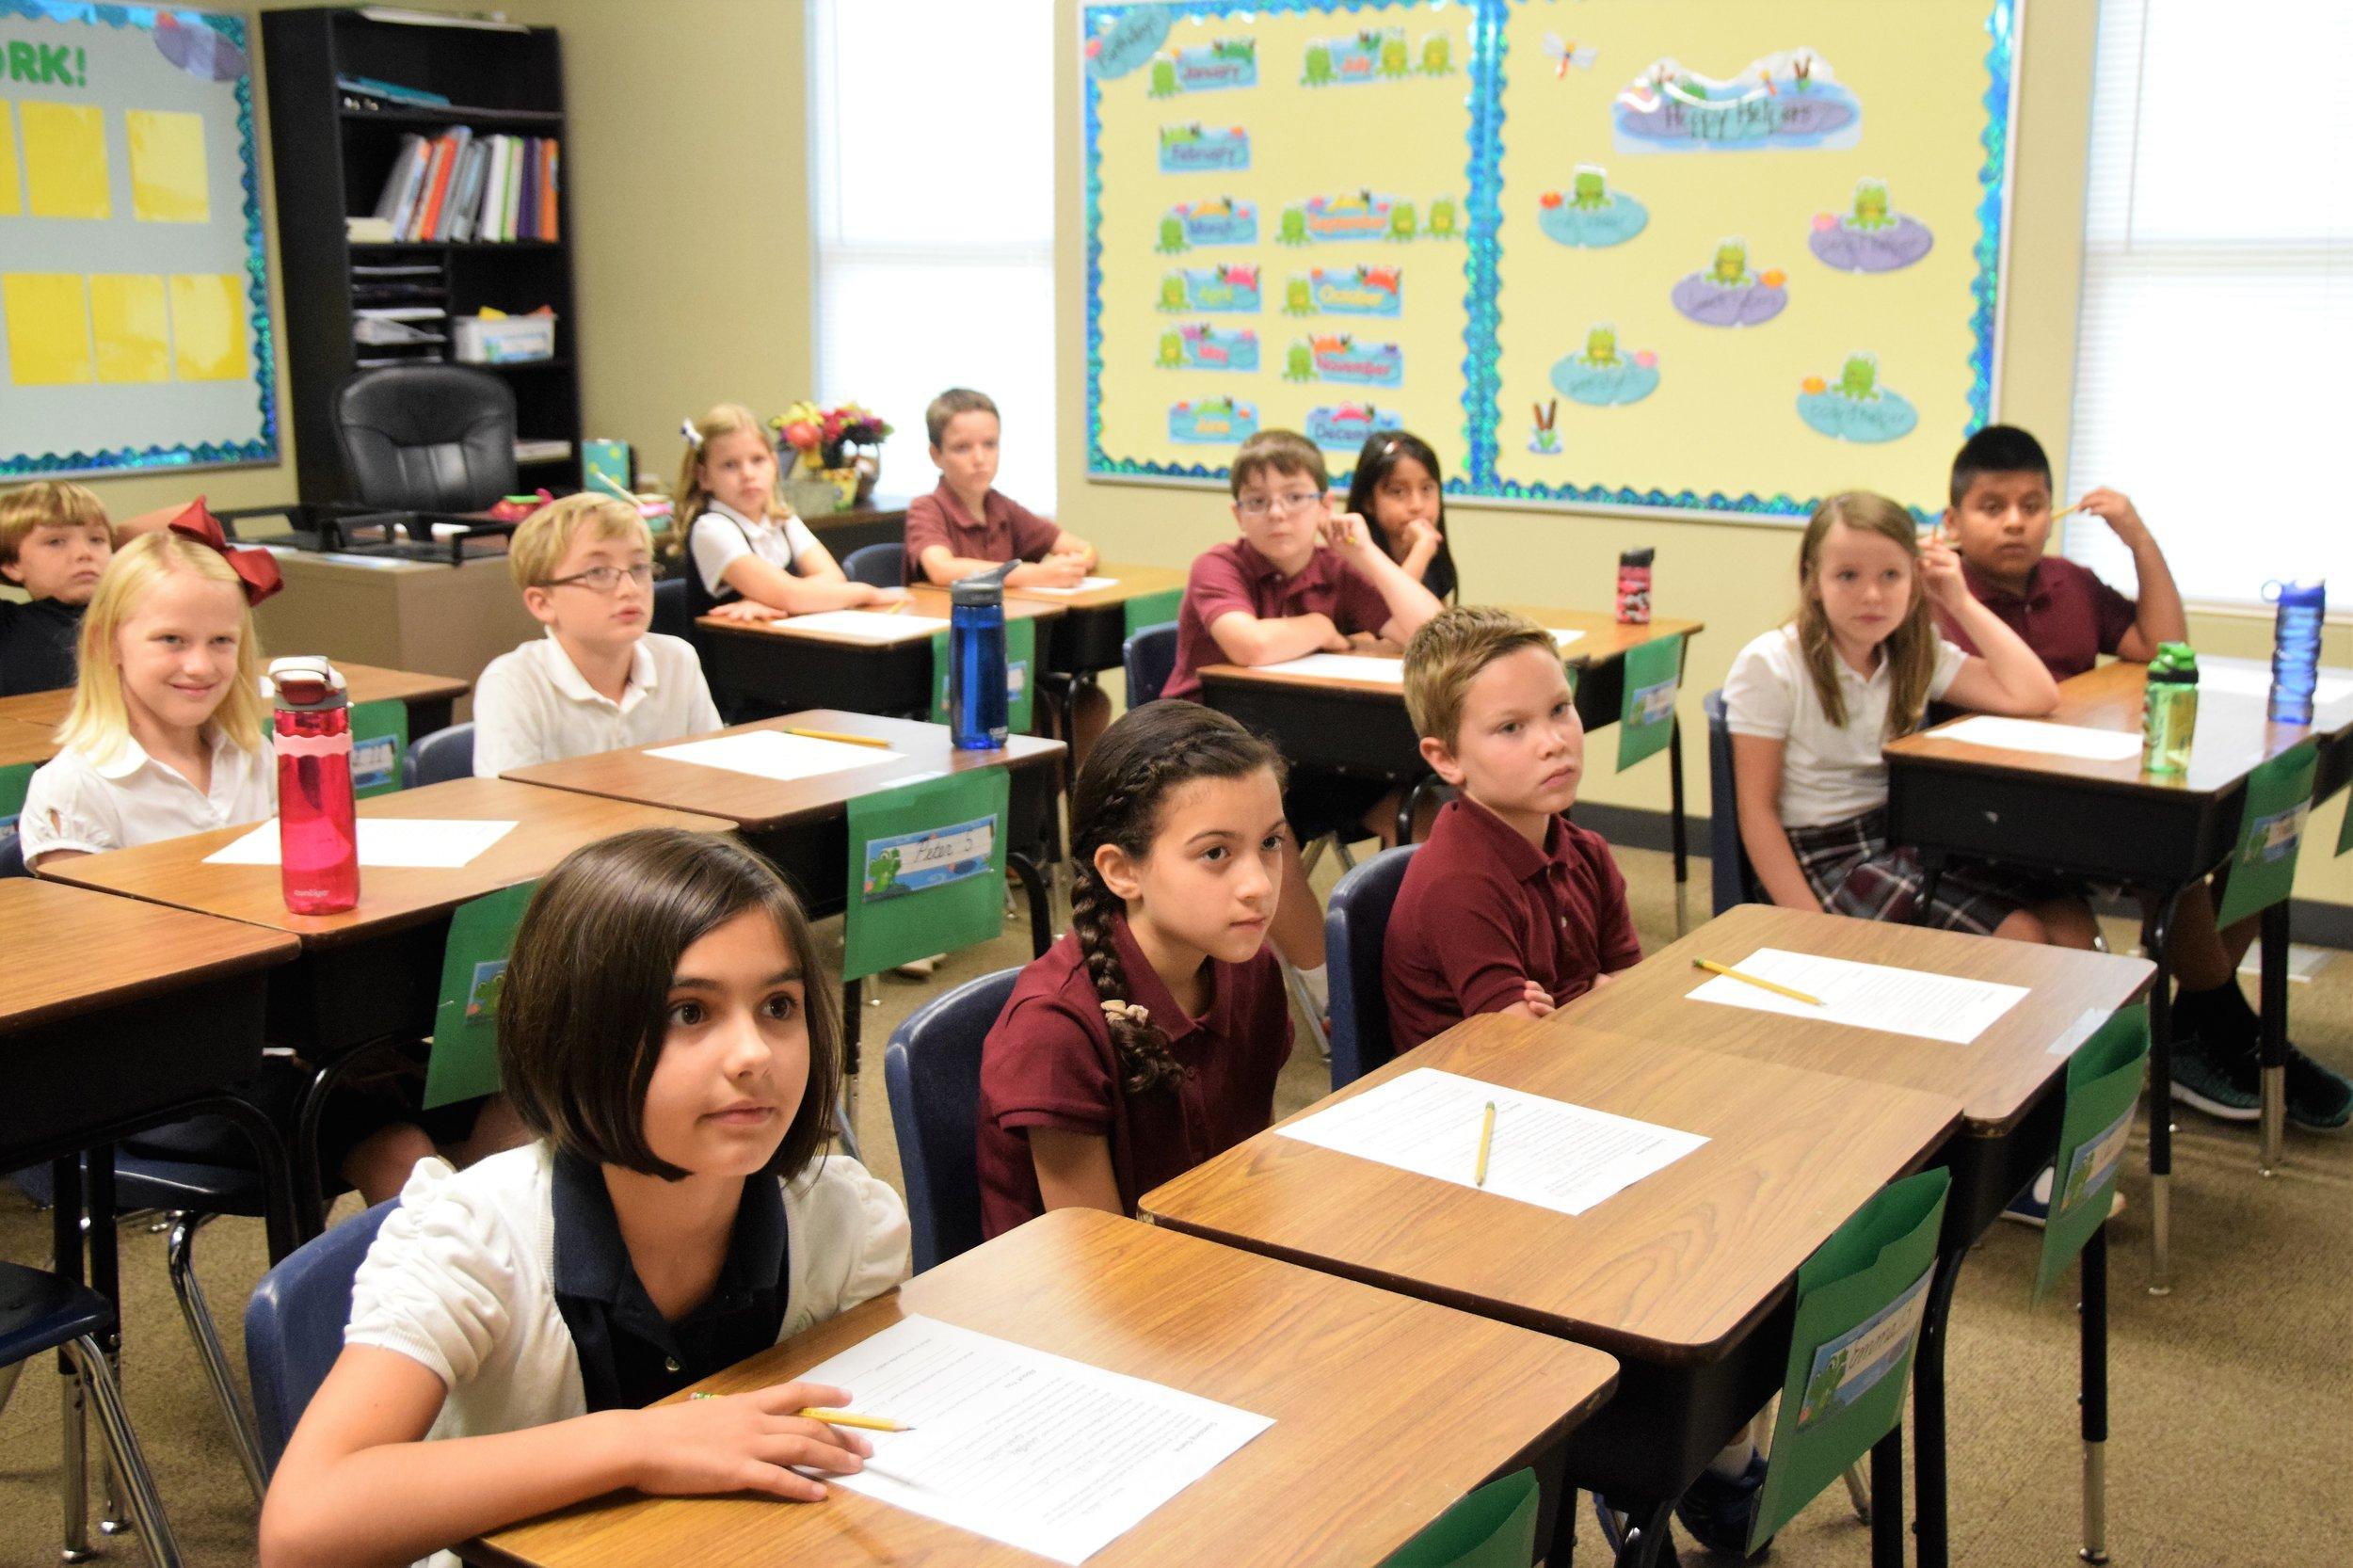 Lower School 1st Day of School 8-23-17 (14).JPG